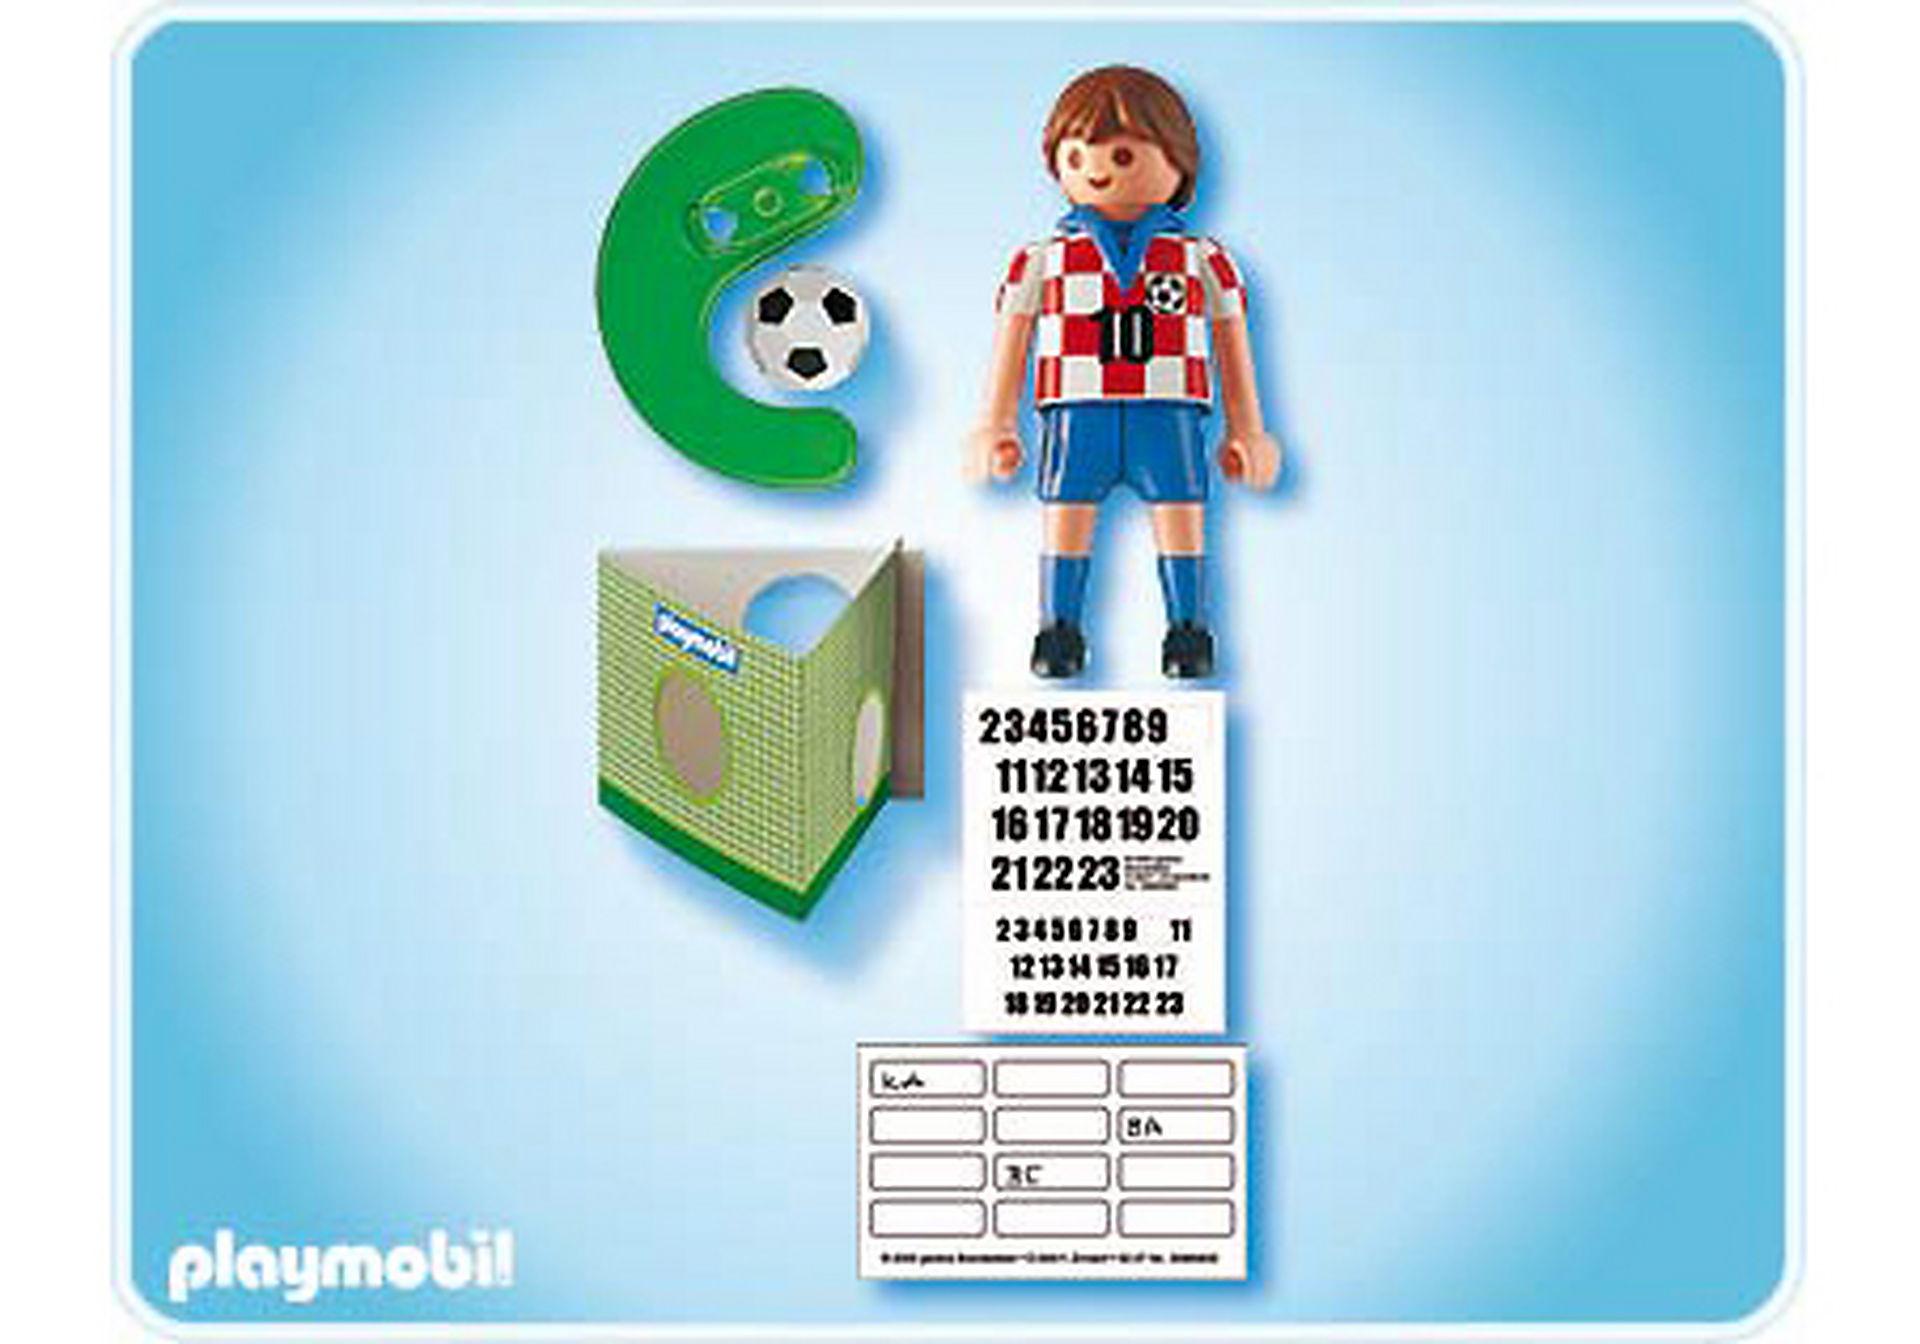 4723-A Fußballspieler Kroatien zoom image2